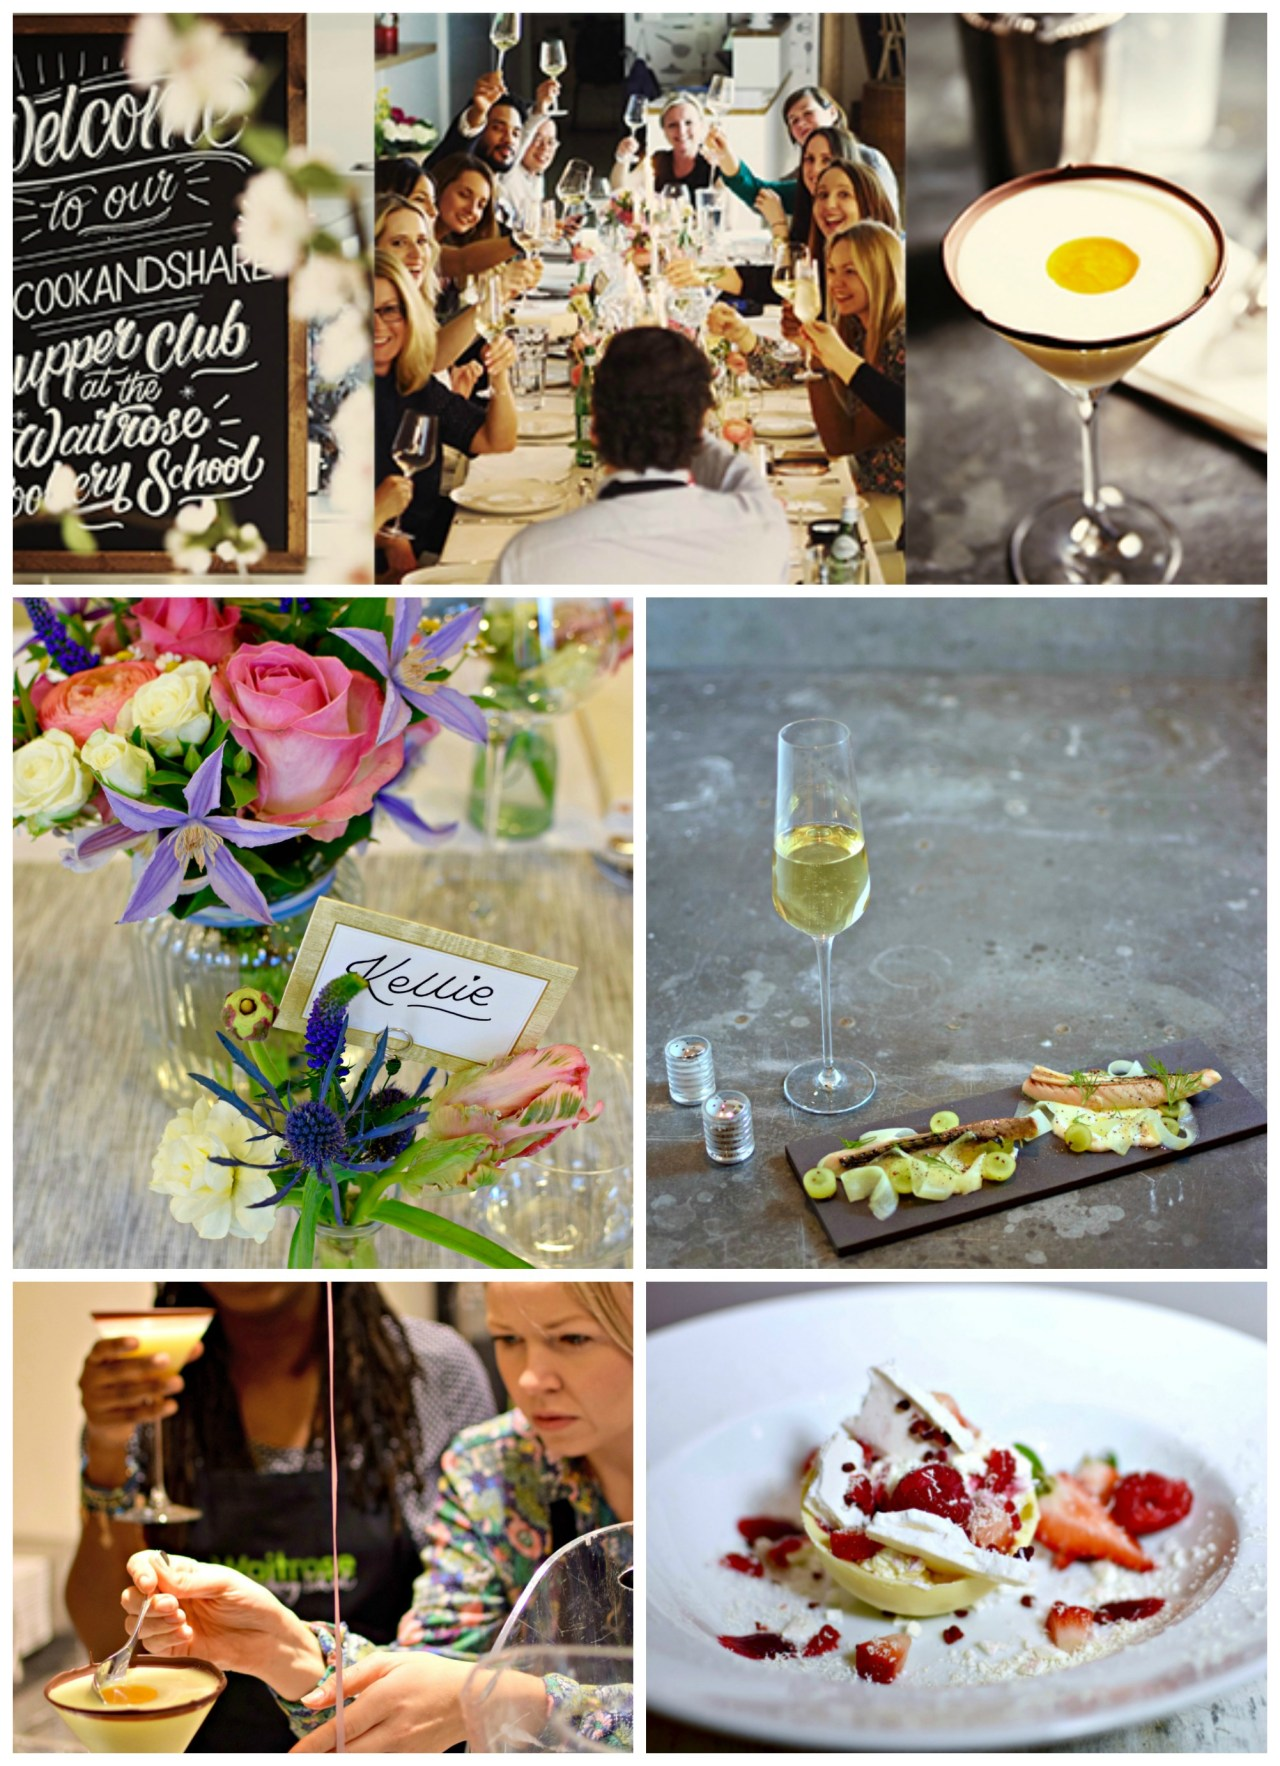 Waitrose #CookandShare event, London